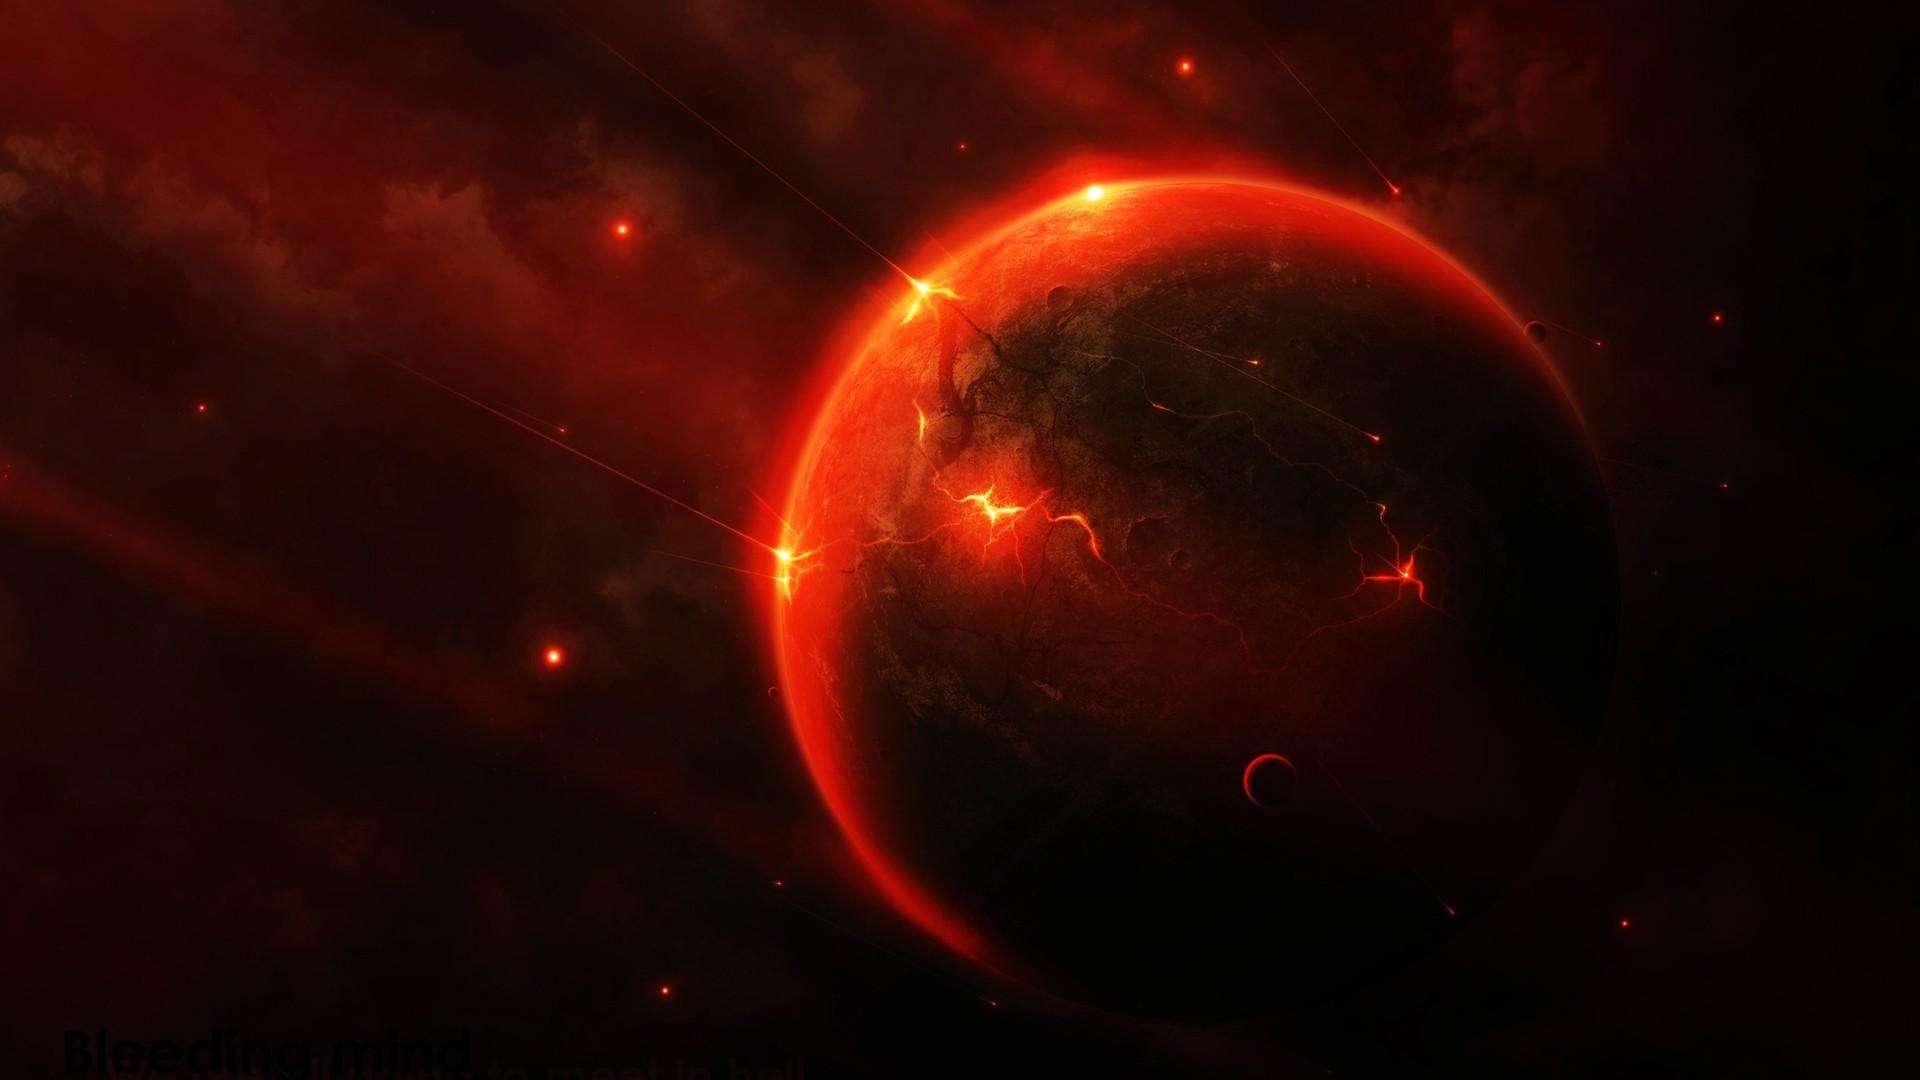 Red Space Desktop Wallpaper